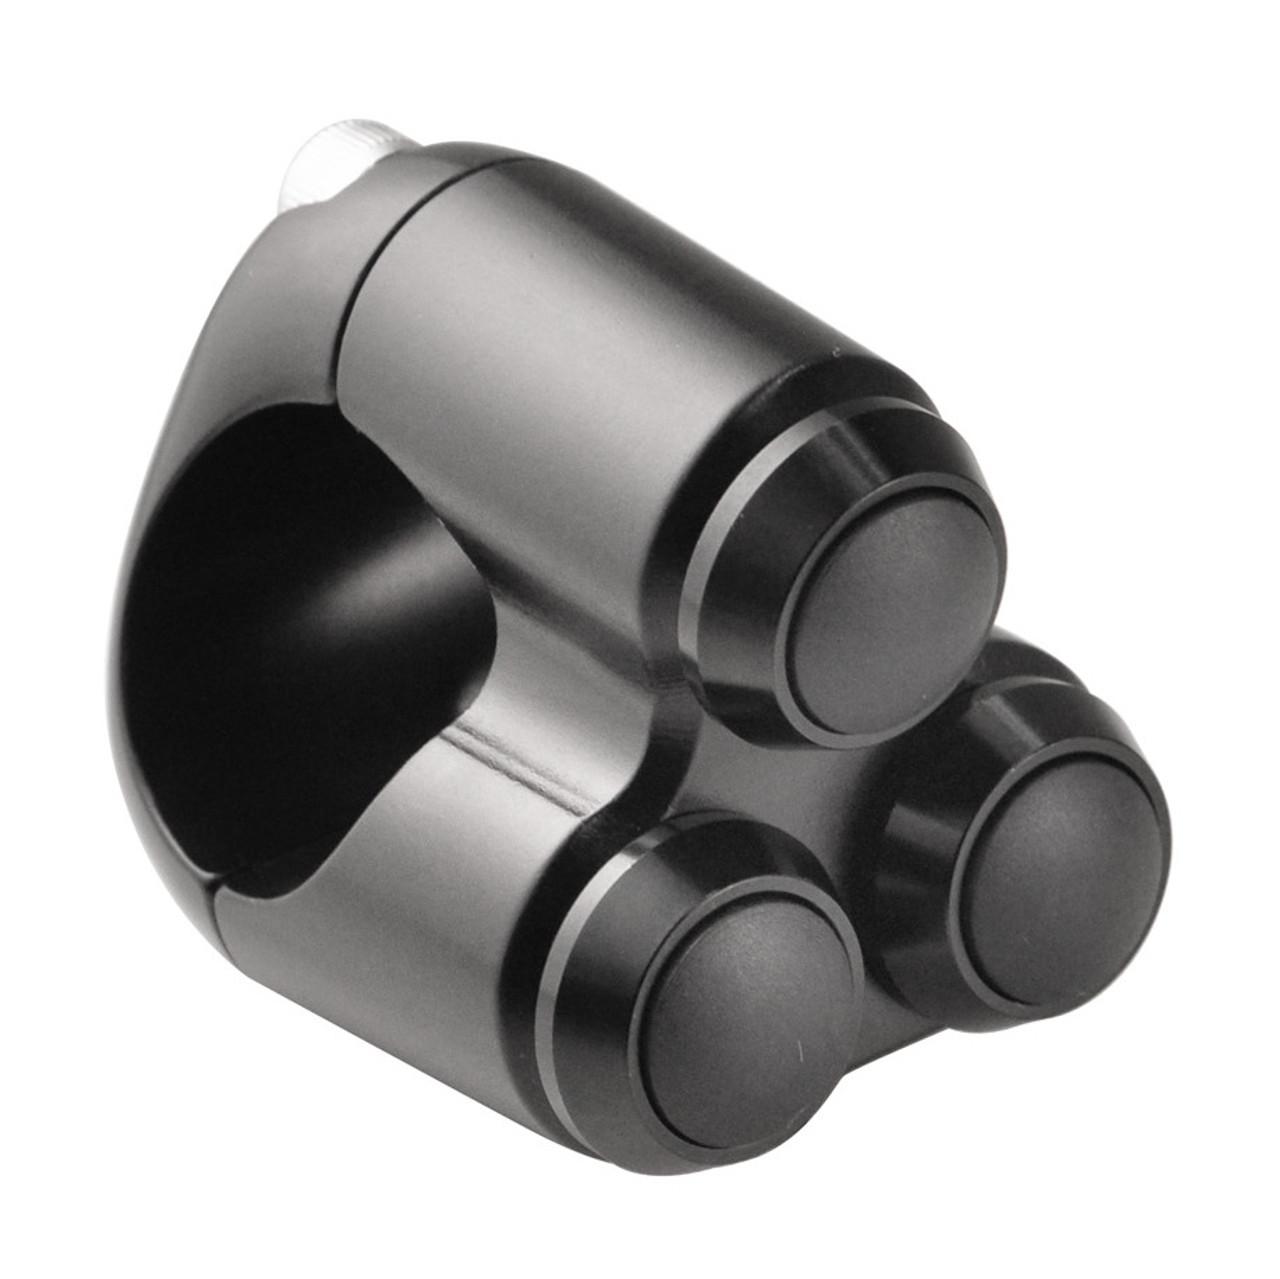 Motone 2-Button Handlebar Switch 1 Bars Black